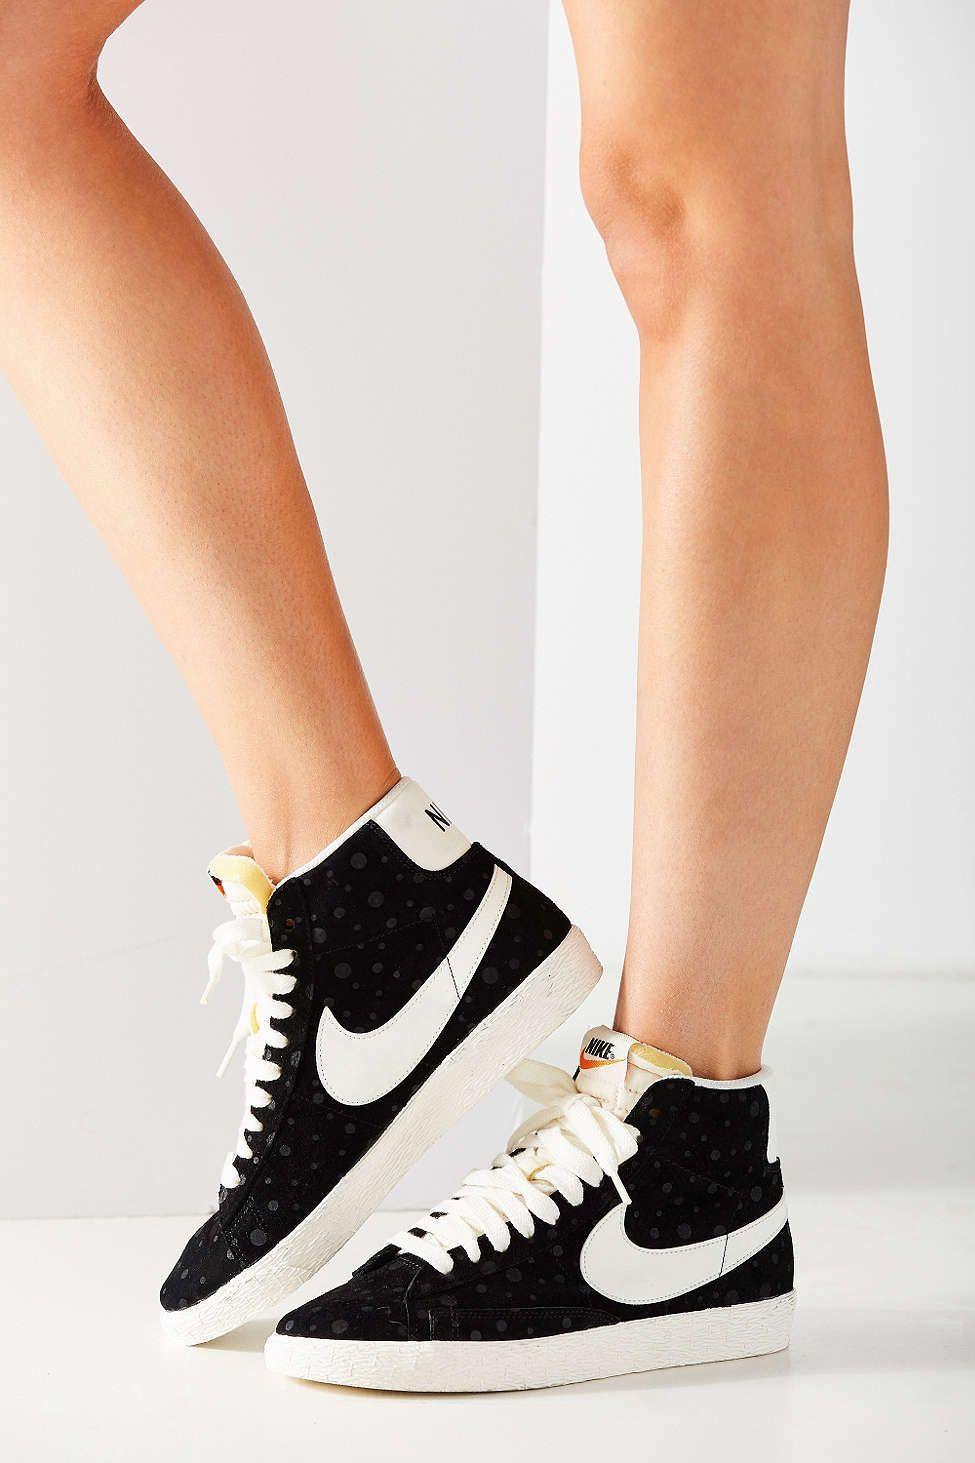 new arrivals d01af 1c14f Nike Womens Blazer Mid Suede Vintage Sneaker | New Wardrobe ...